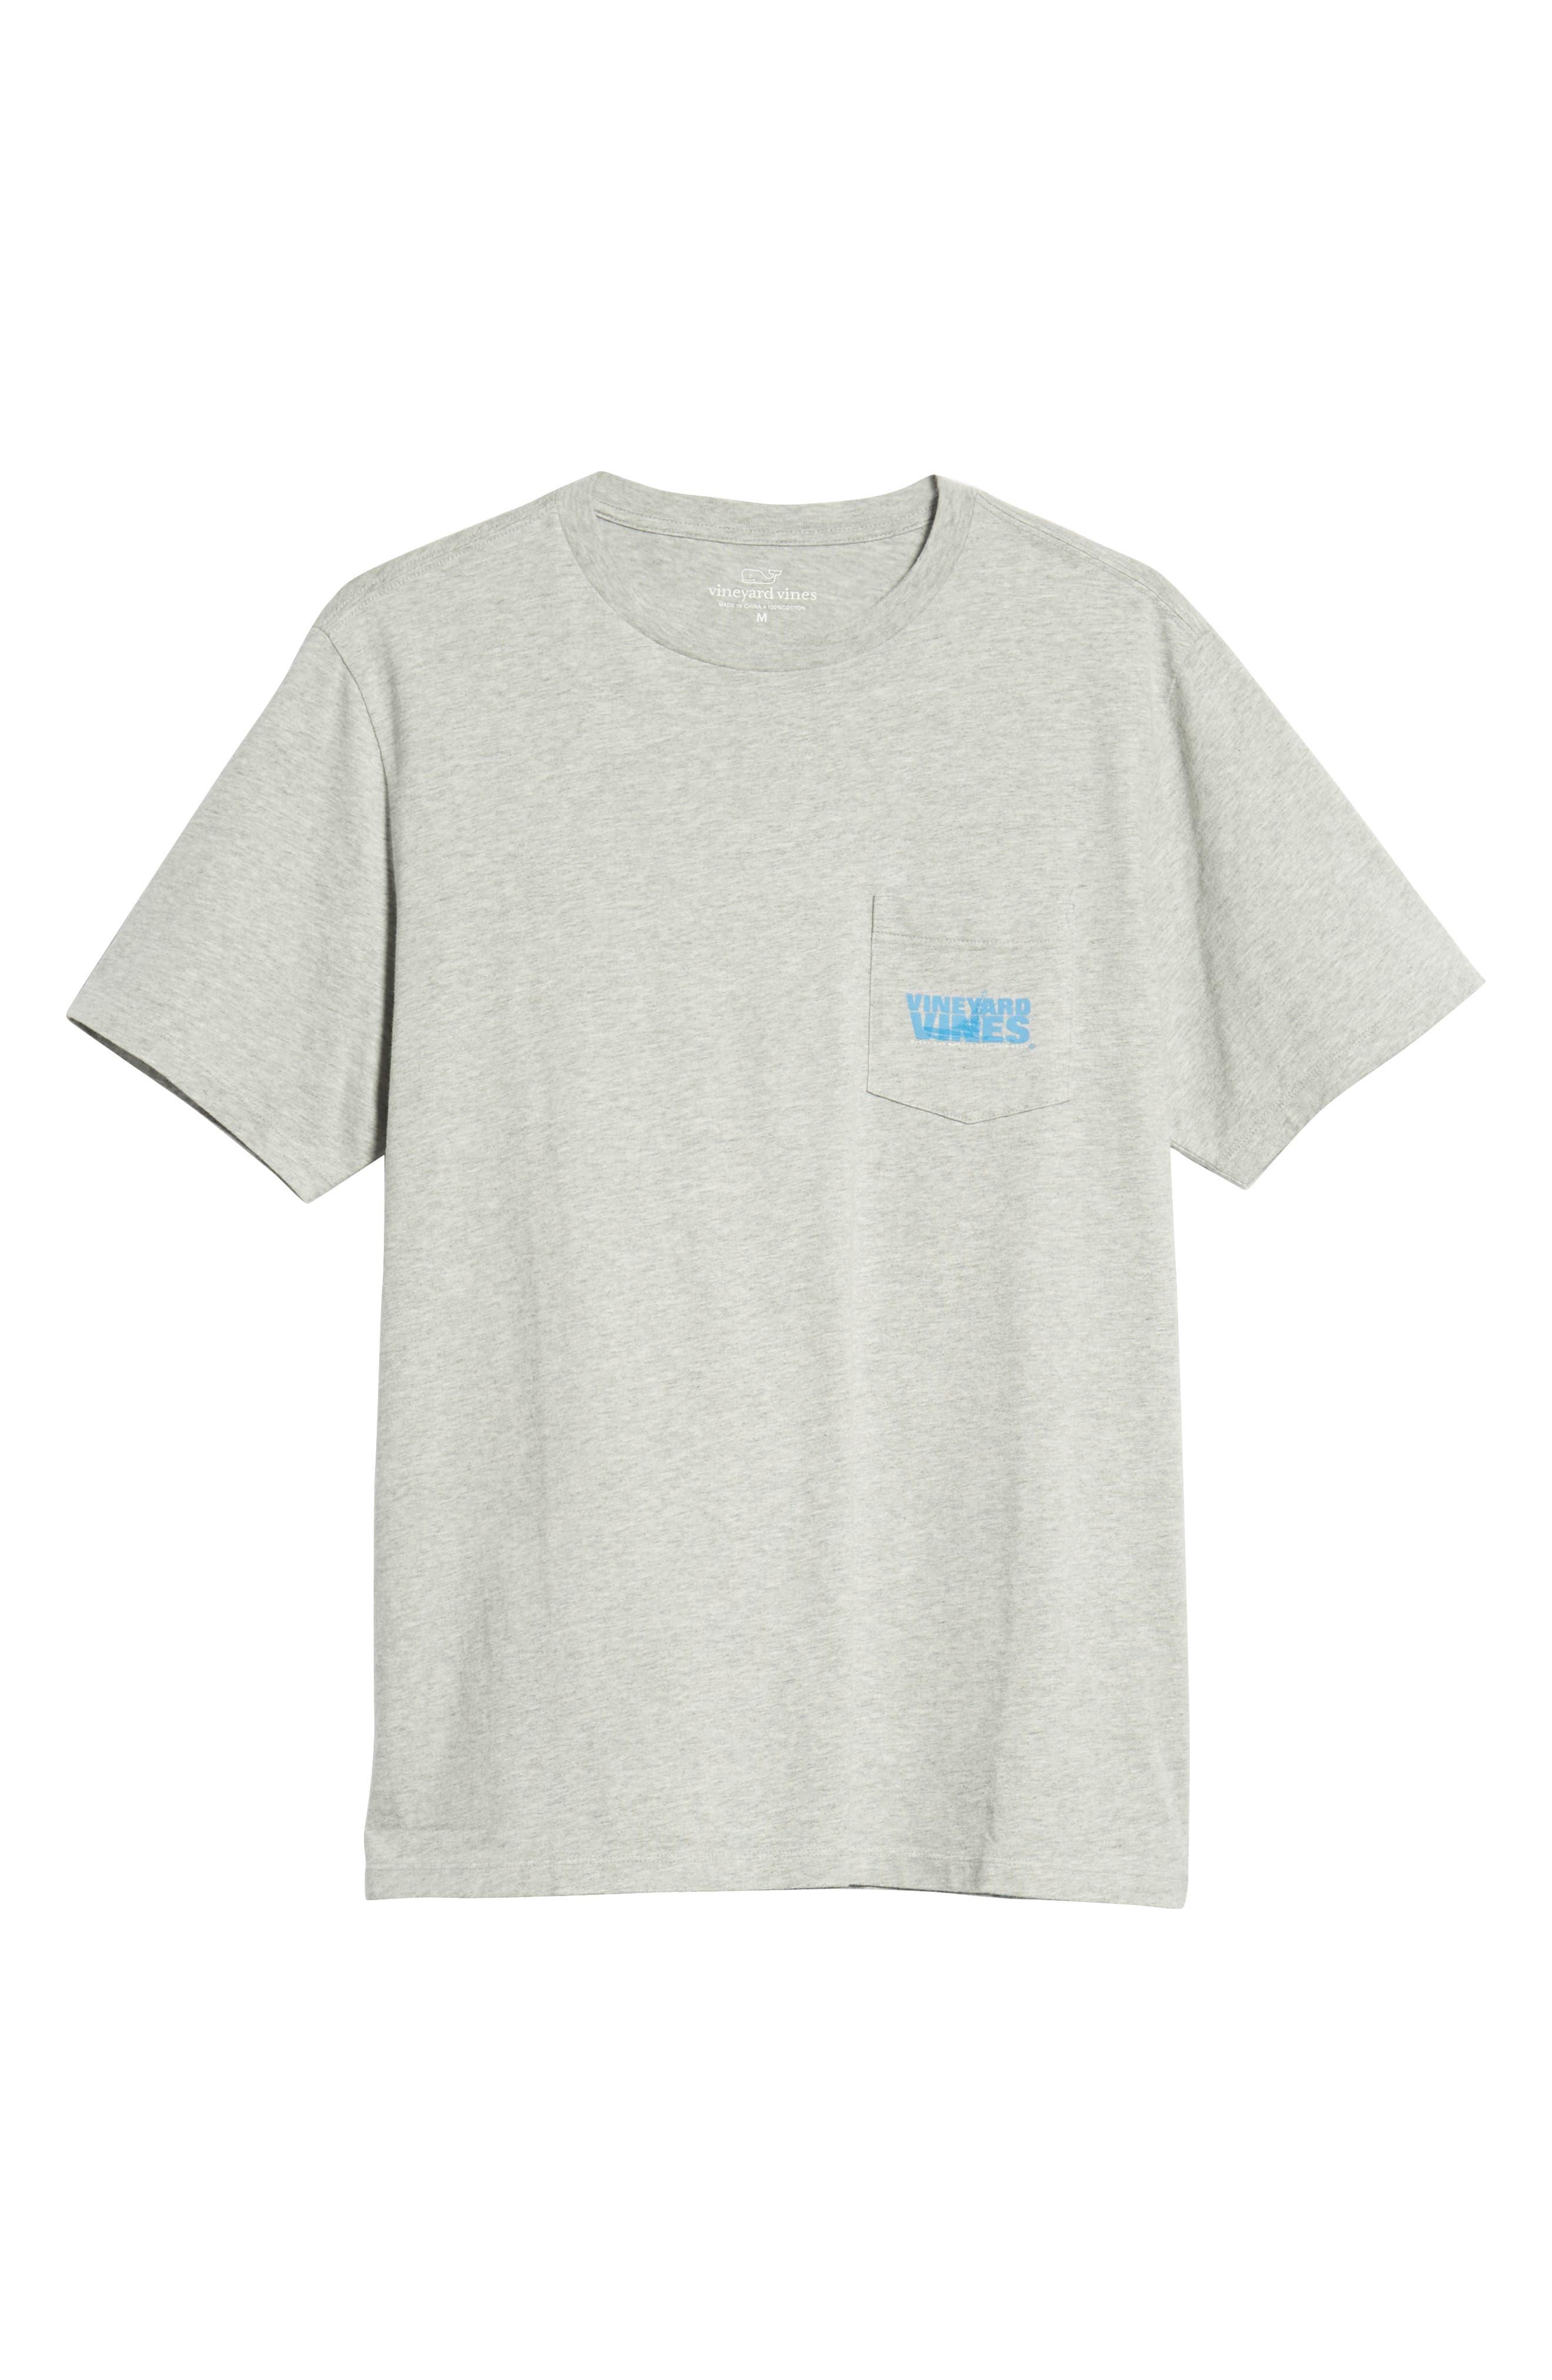 Knockout Sportfisher T-Shirt,                             Alternate thumbnail 6, color,                             GRAY HEATHER